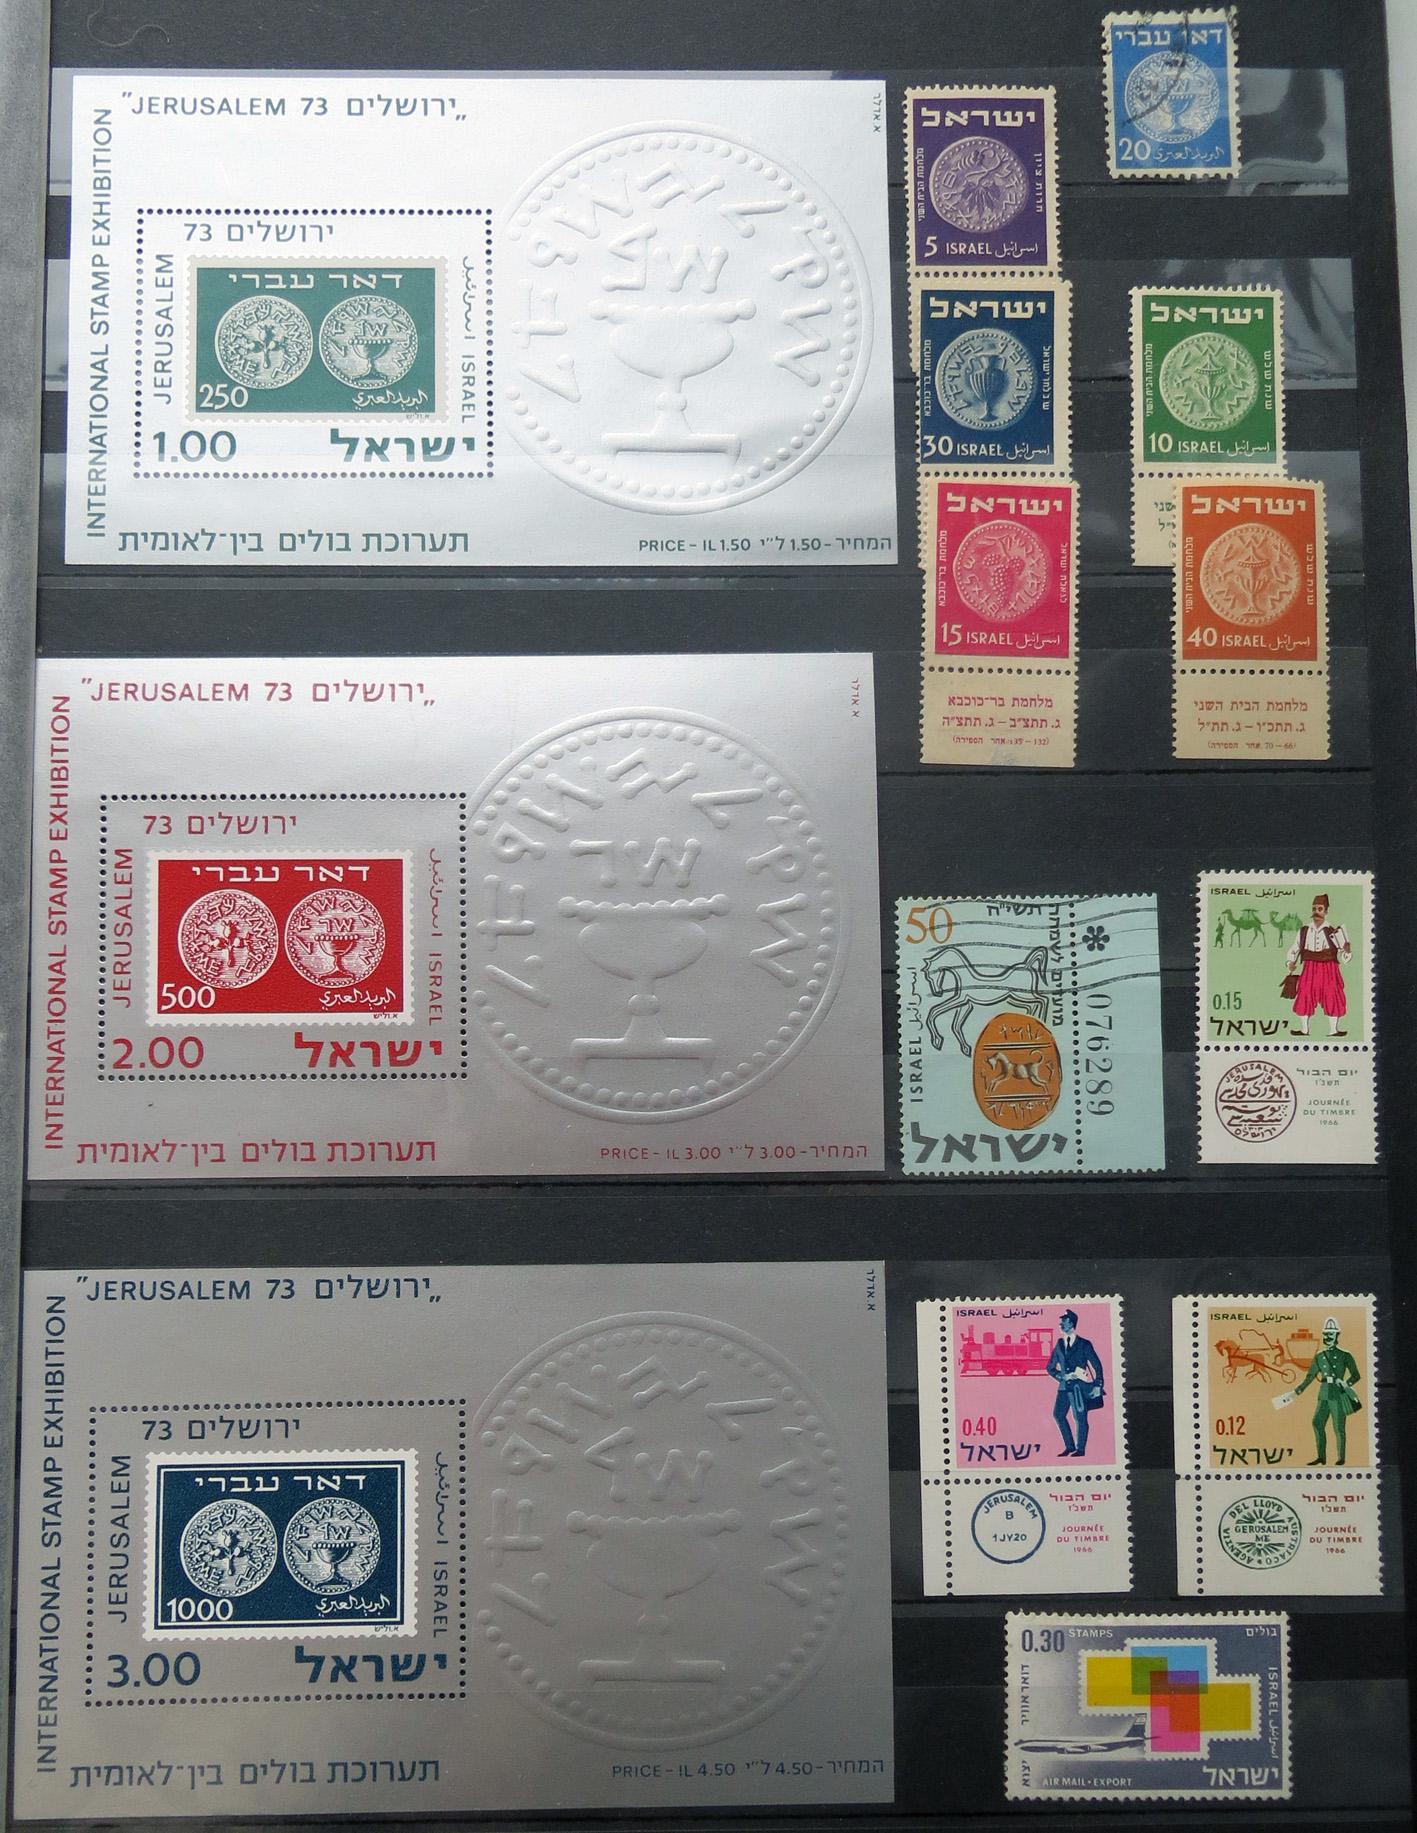 марки для сайта